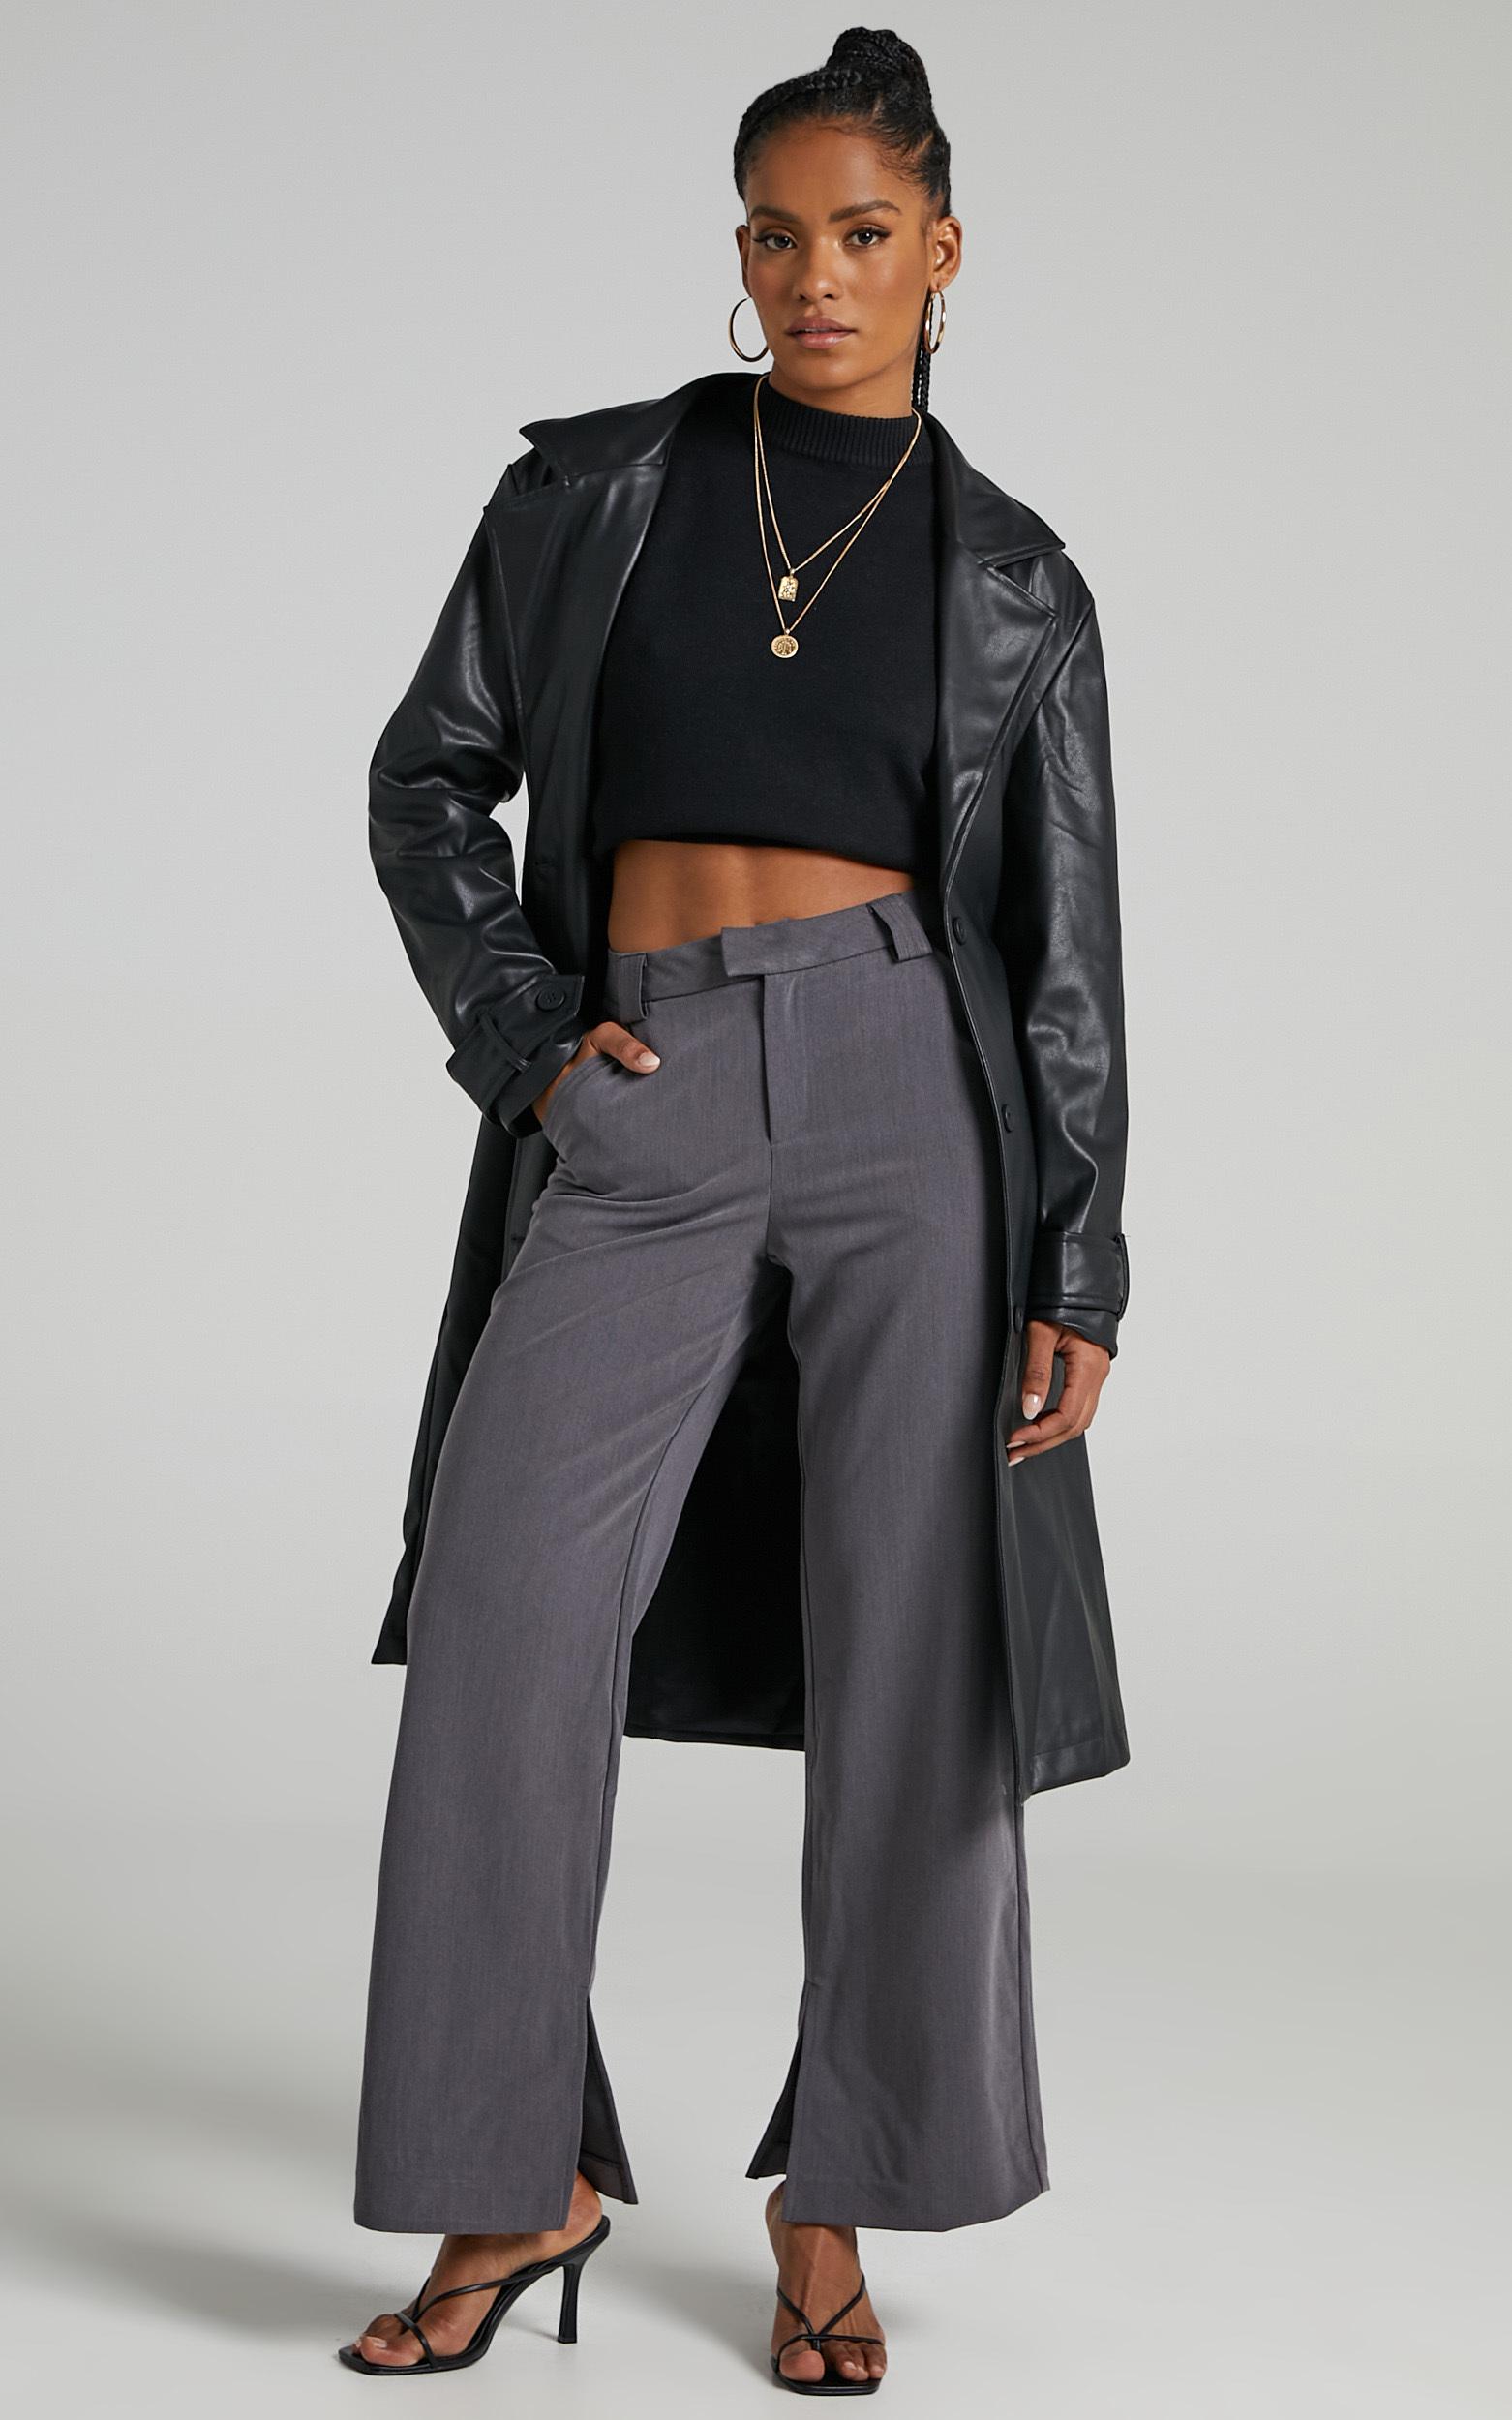 Desdemona Coat in Black - 06, BLK1, hi-res image number null